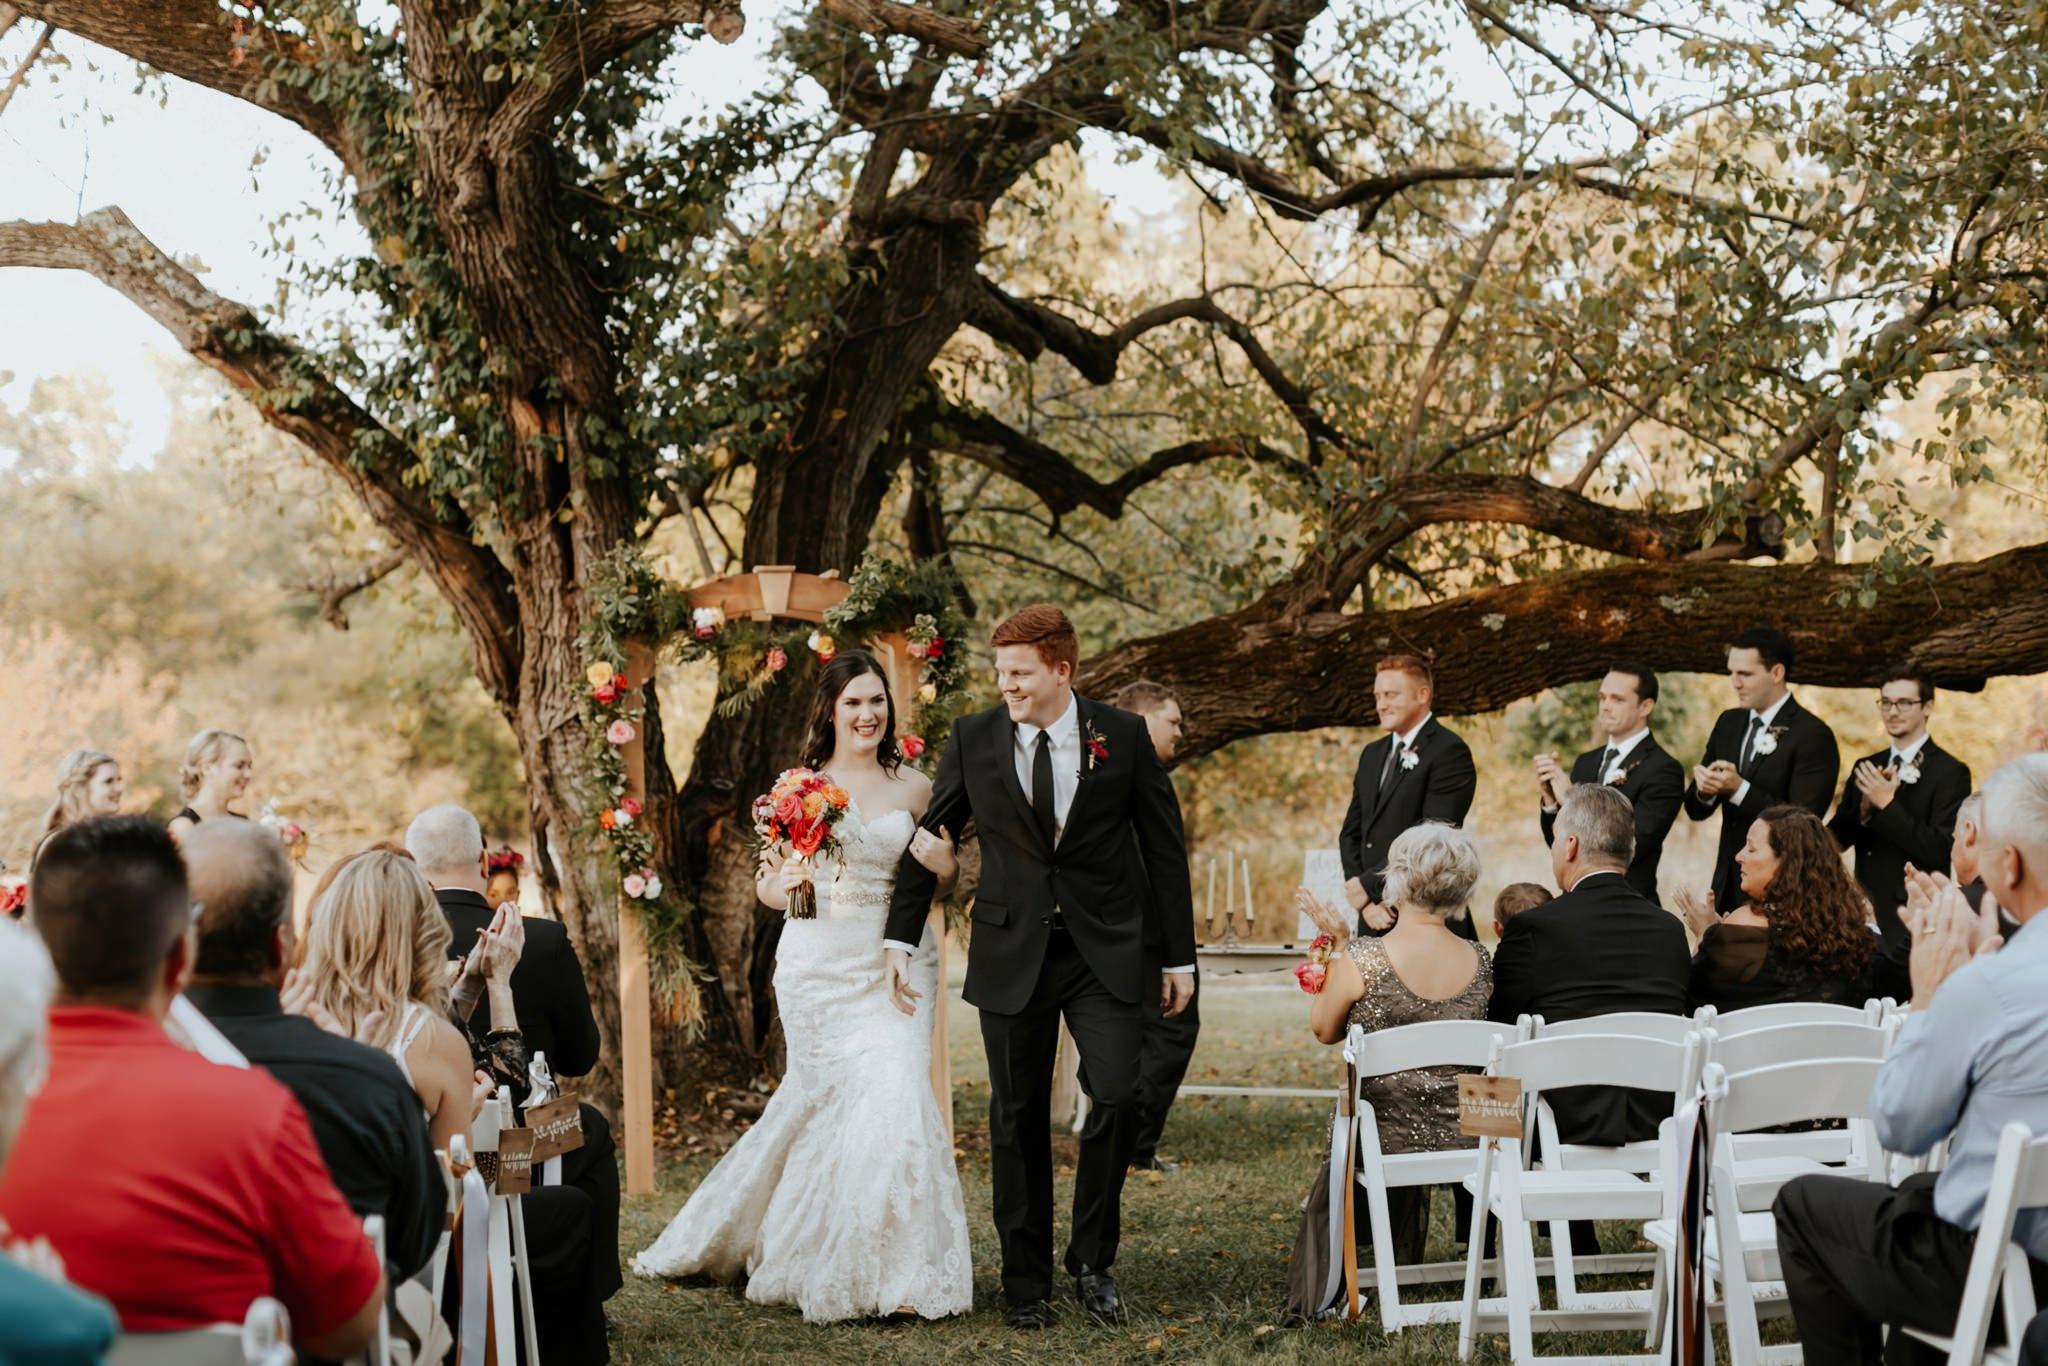 17-09-15 Lindsey and Brandon Wedding Edited-733_WEB.jpg